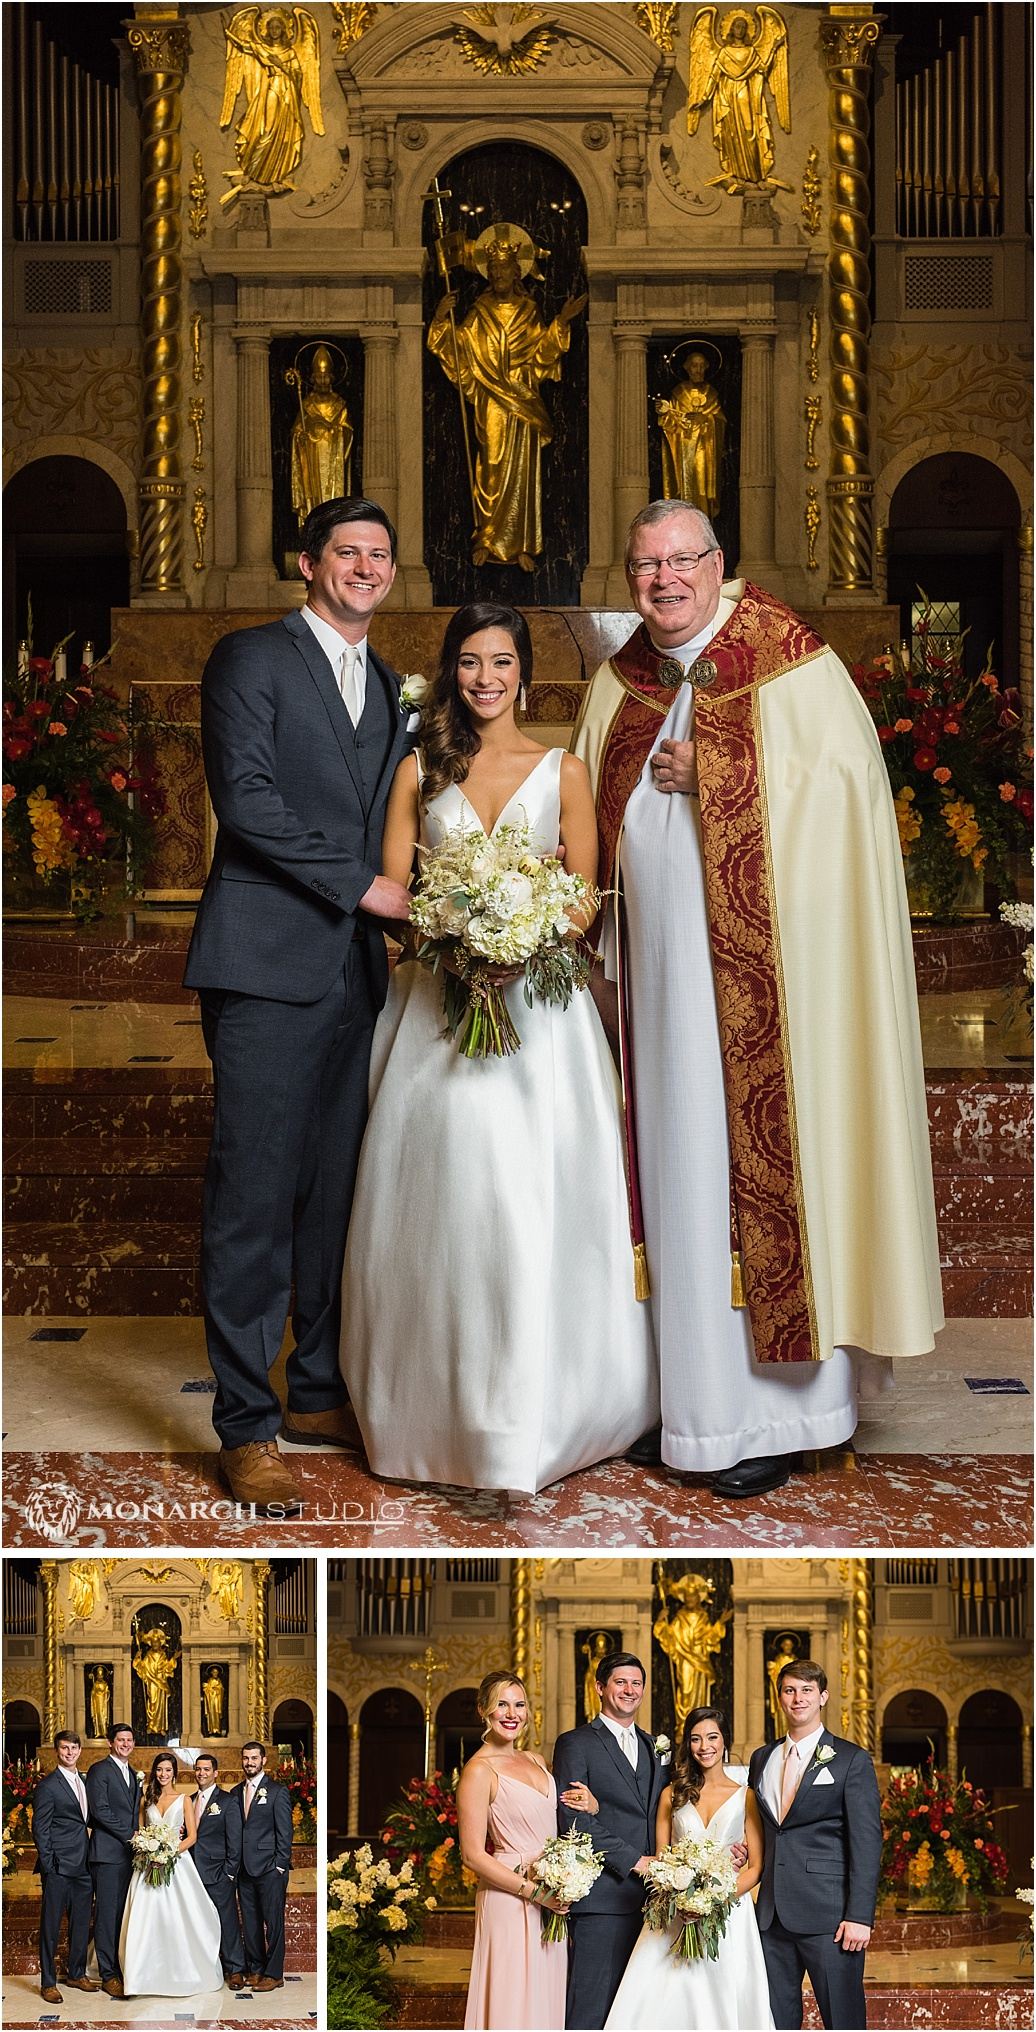 st-augustine-wedding-photographer-078.jpg